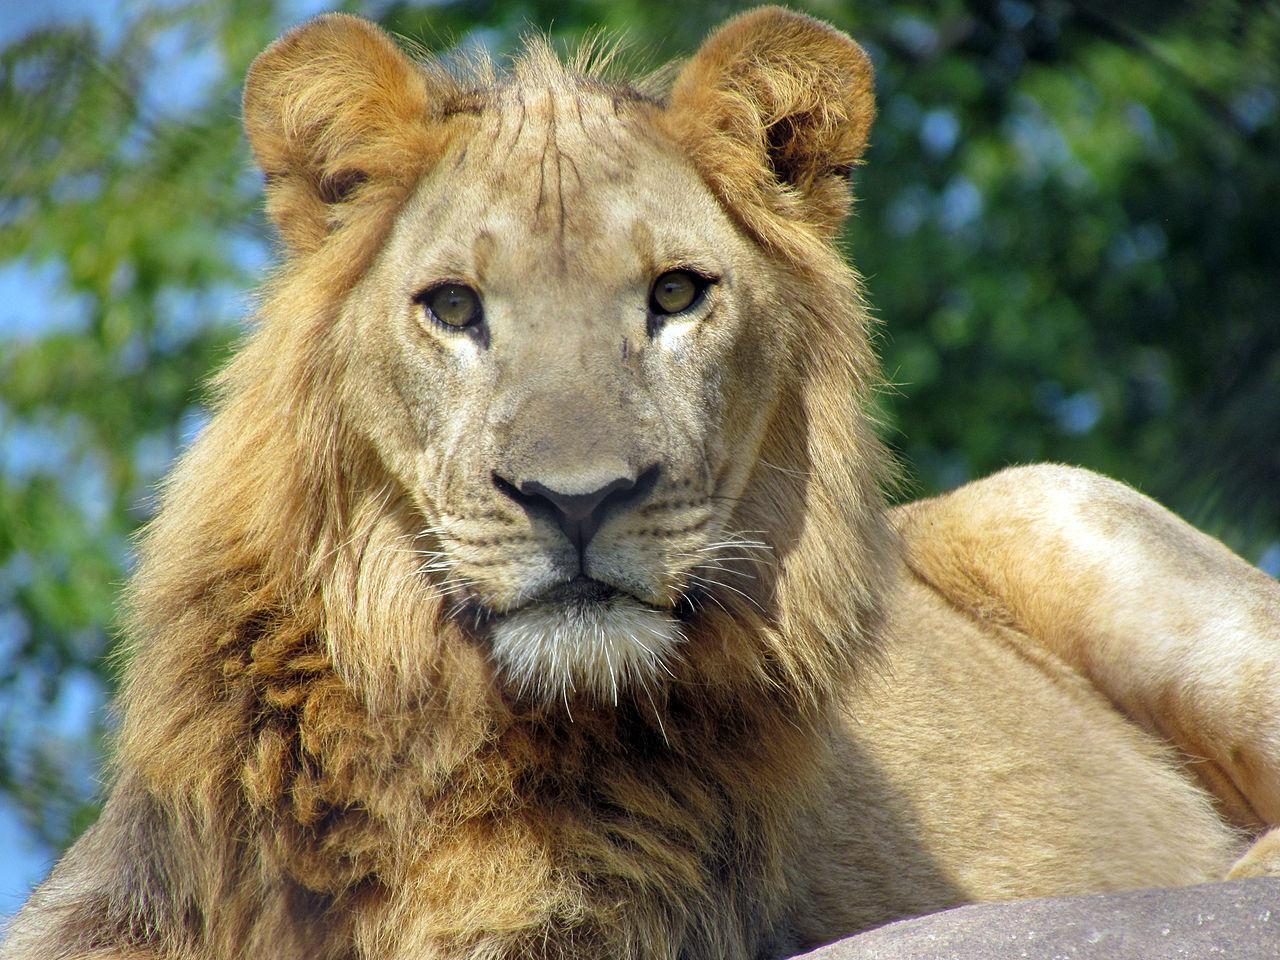 FileAfrican Lion Seneca Park ZooJPG Wikimedia Commons